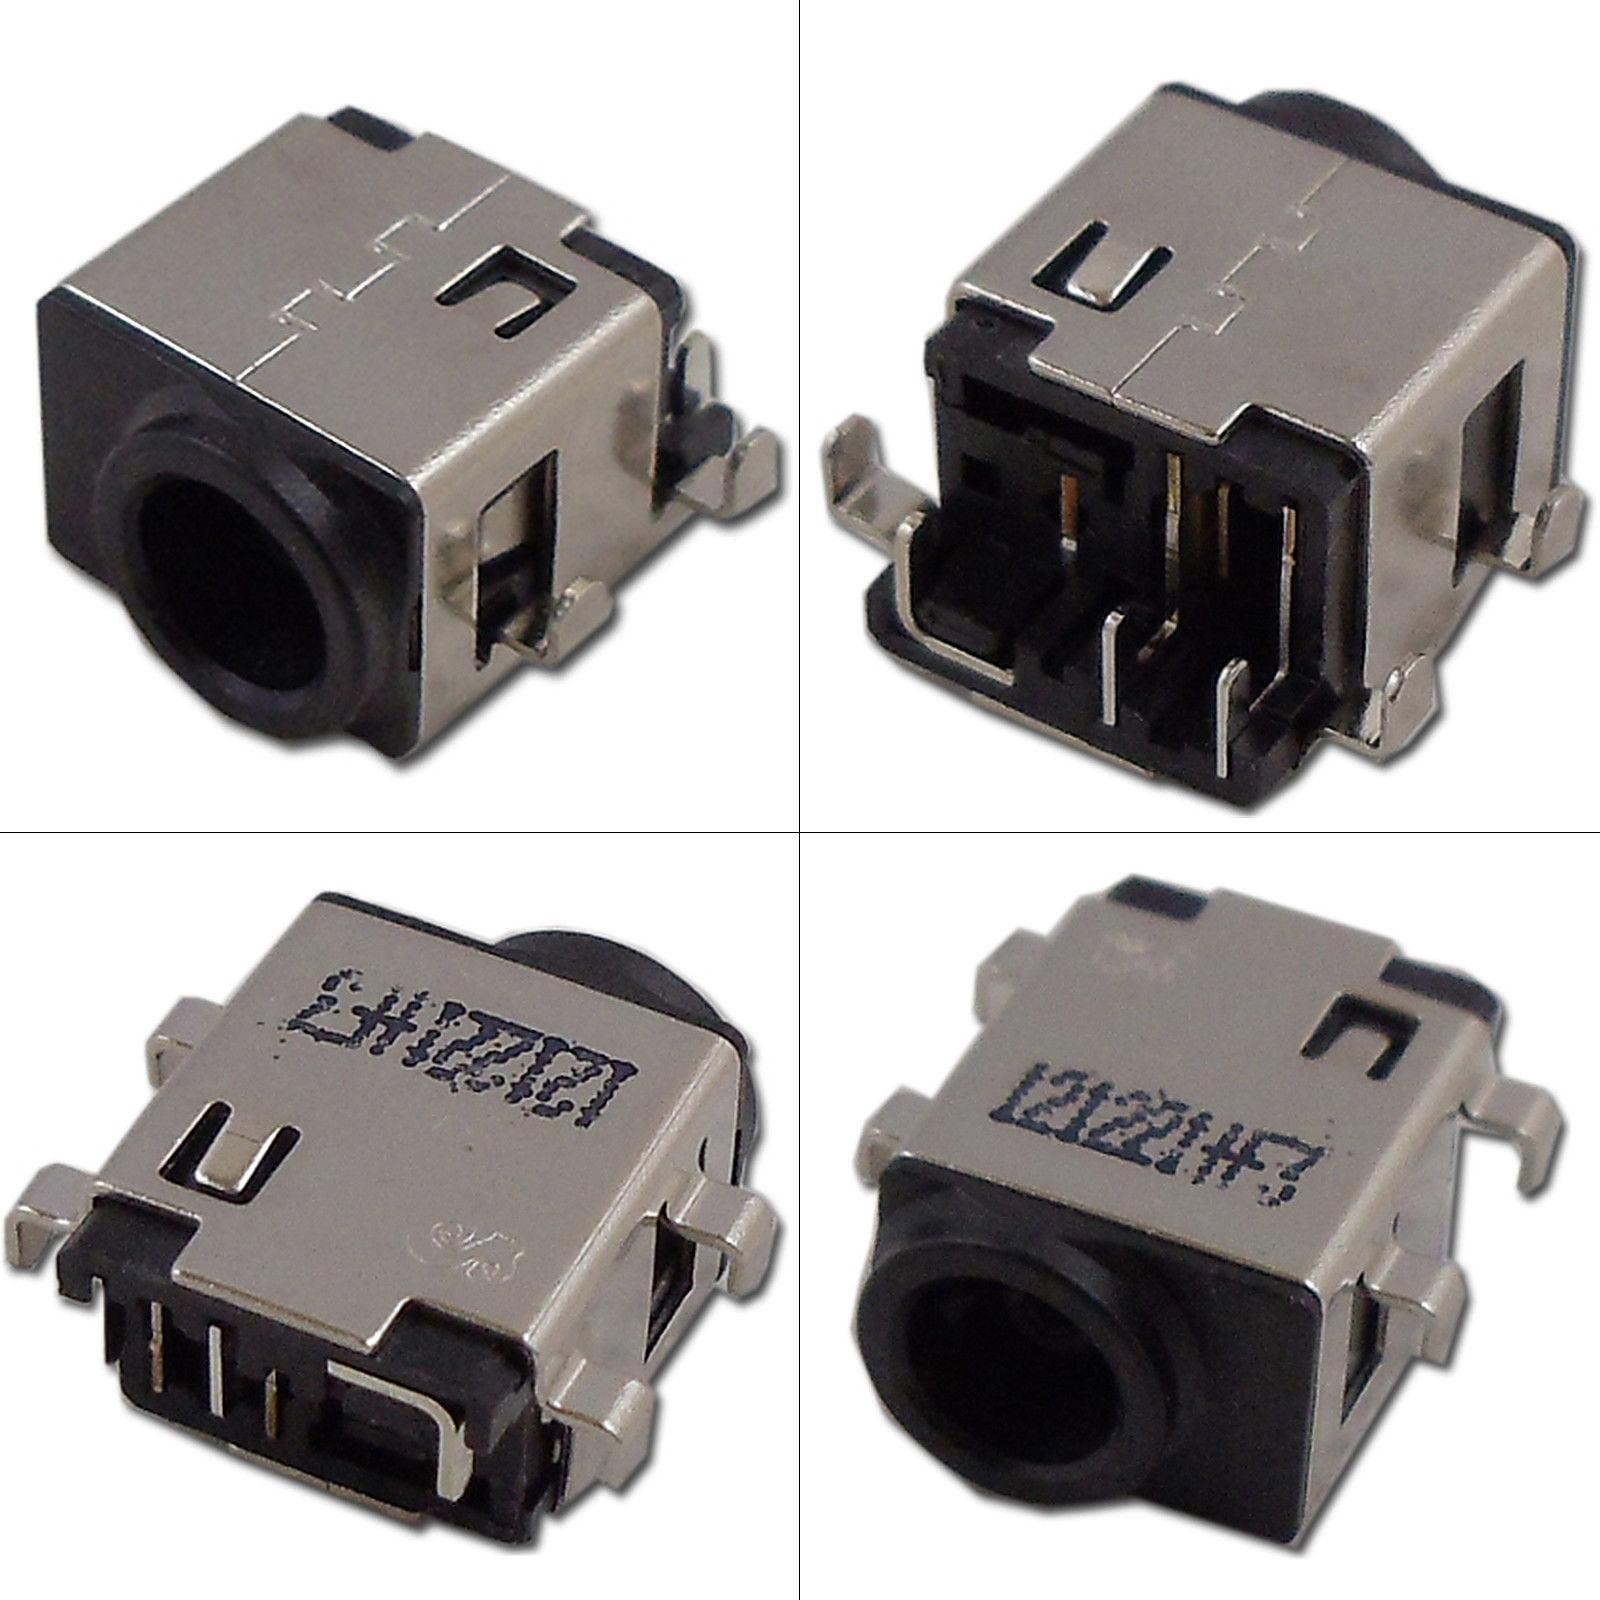 New DC Power Jack Socket for Samsung NP530E5M NP530E5M-X02US NP530E5M-X01US